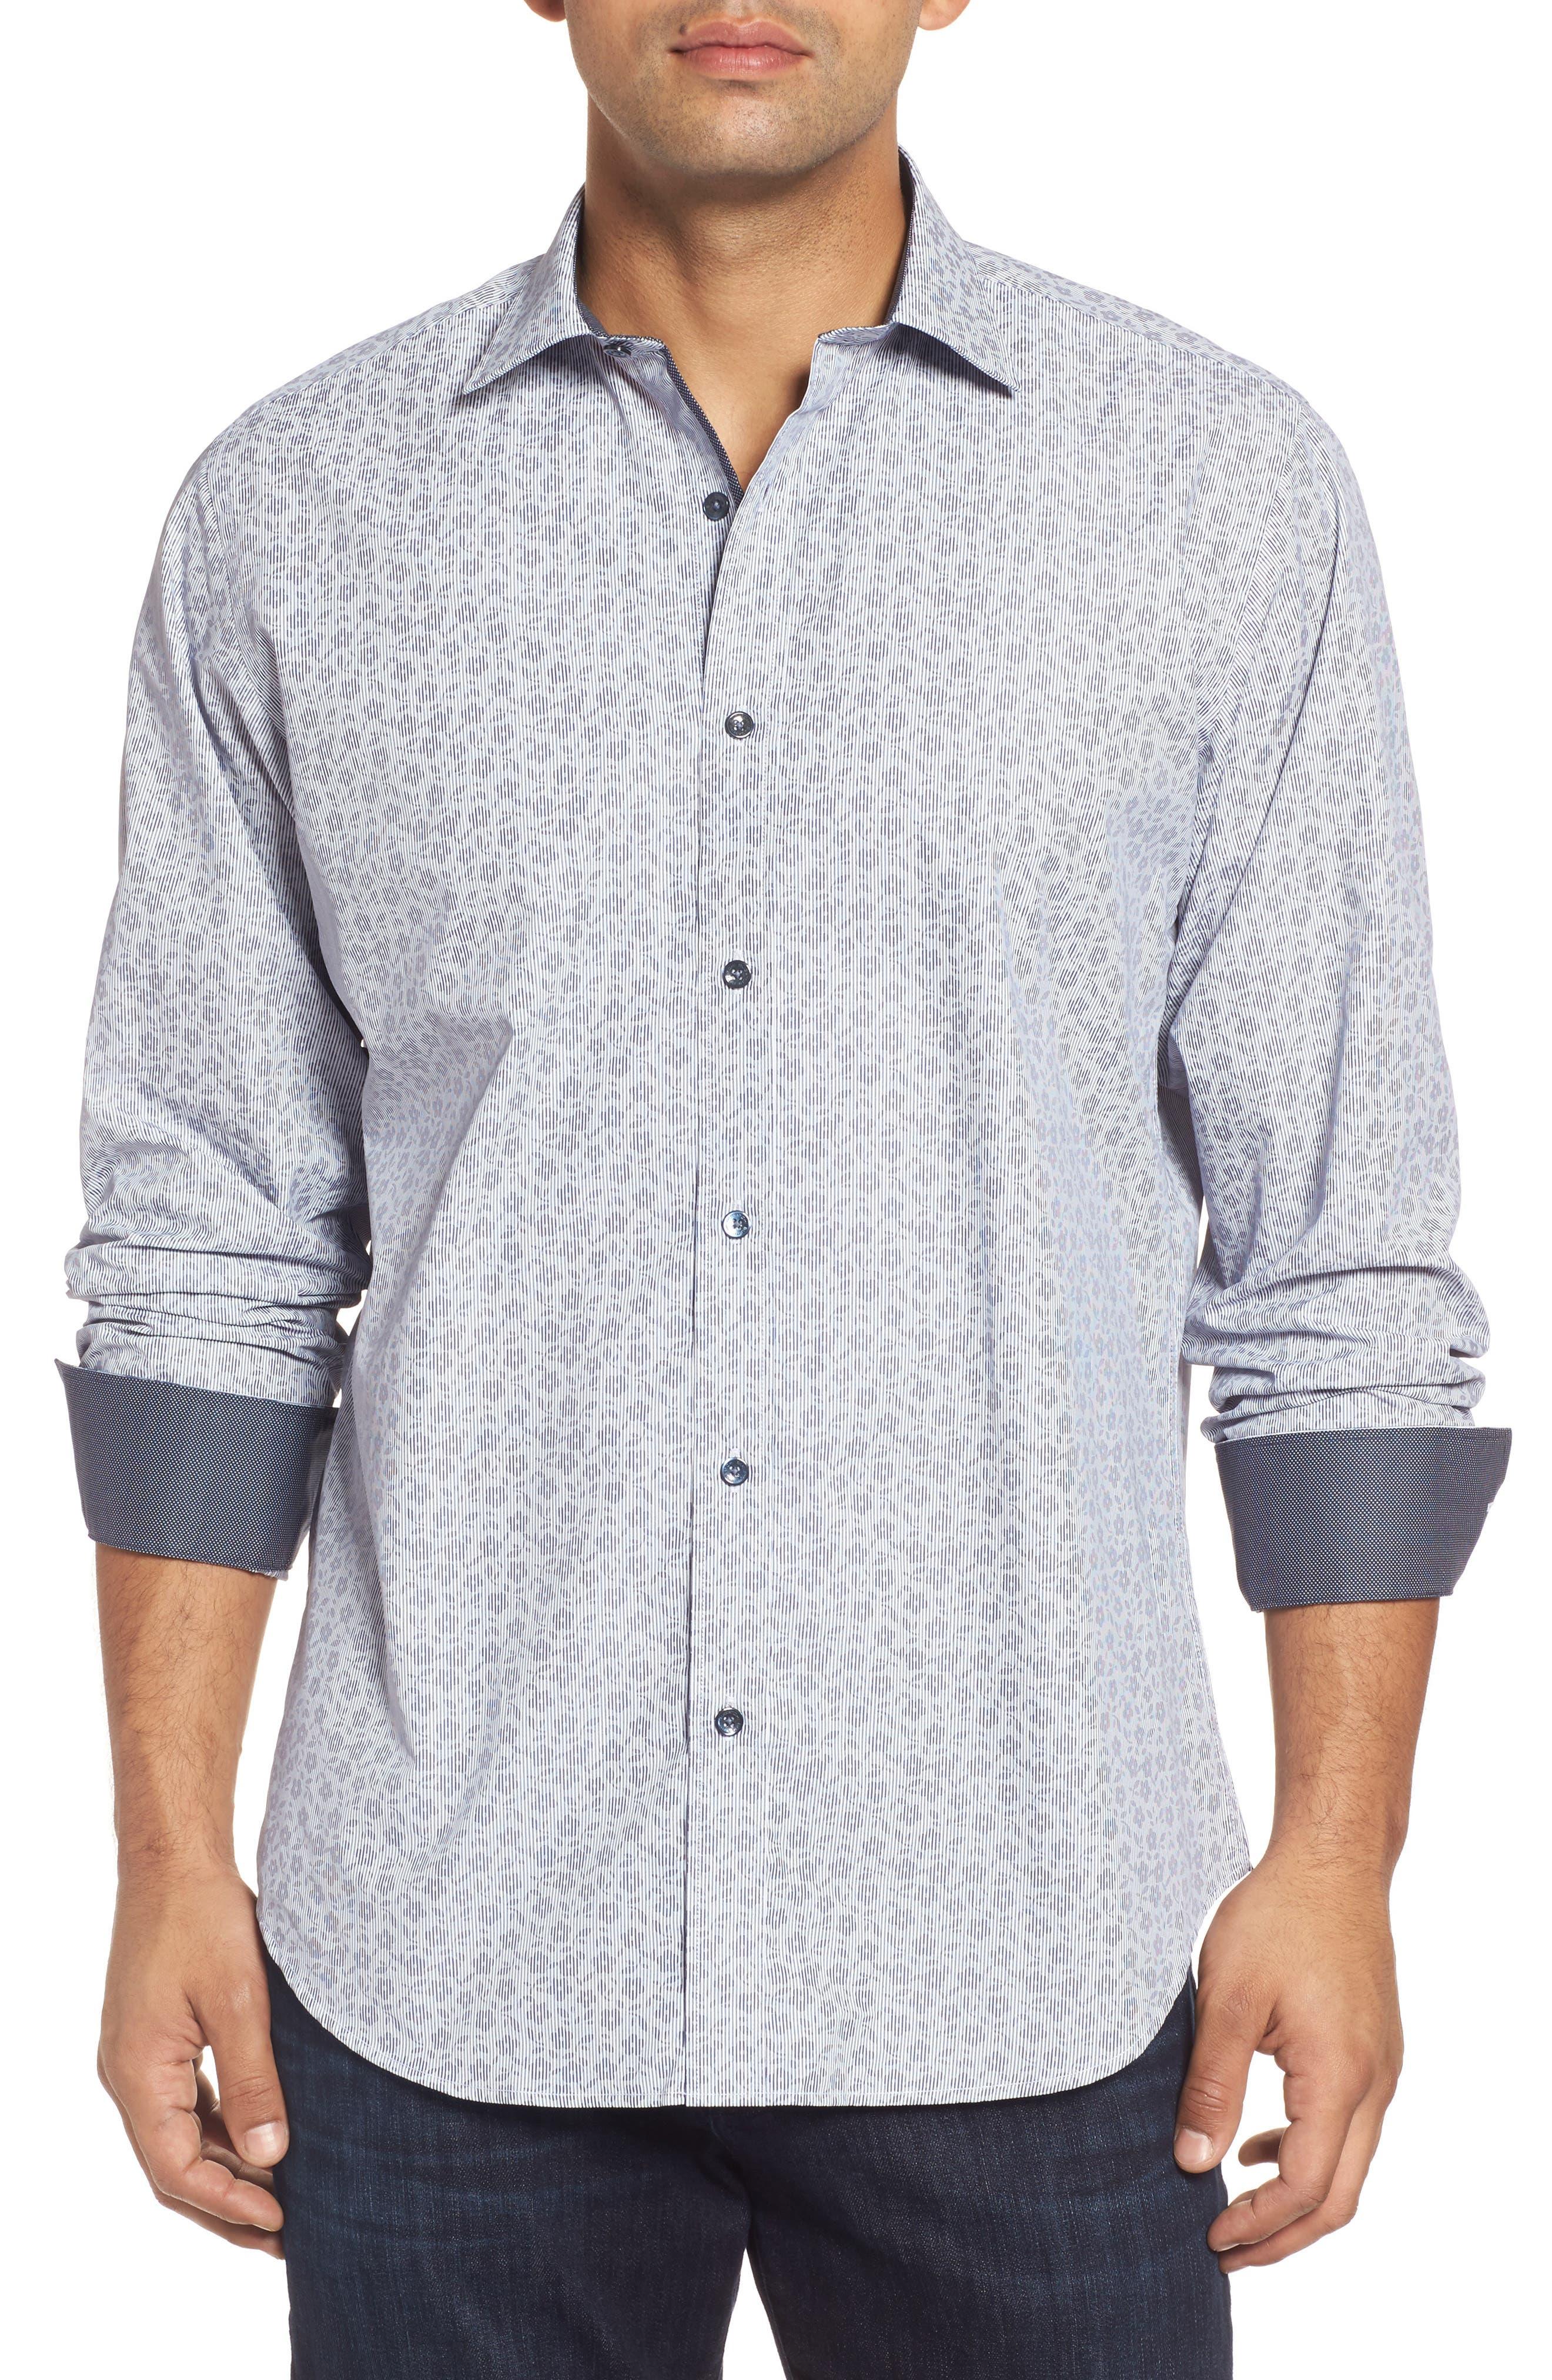 Classic Fit Floral Pinstripe Sport Shirt,                             Main thumbnail 1, color,                             030